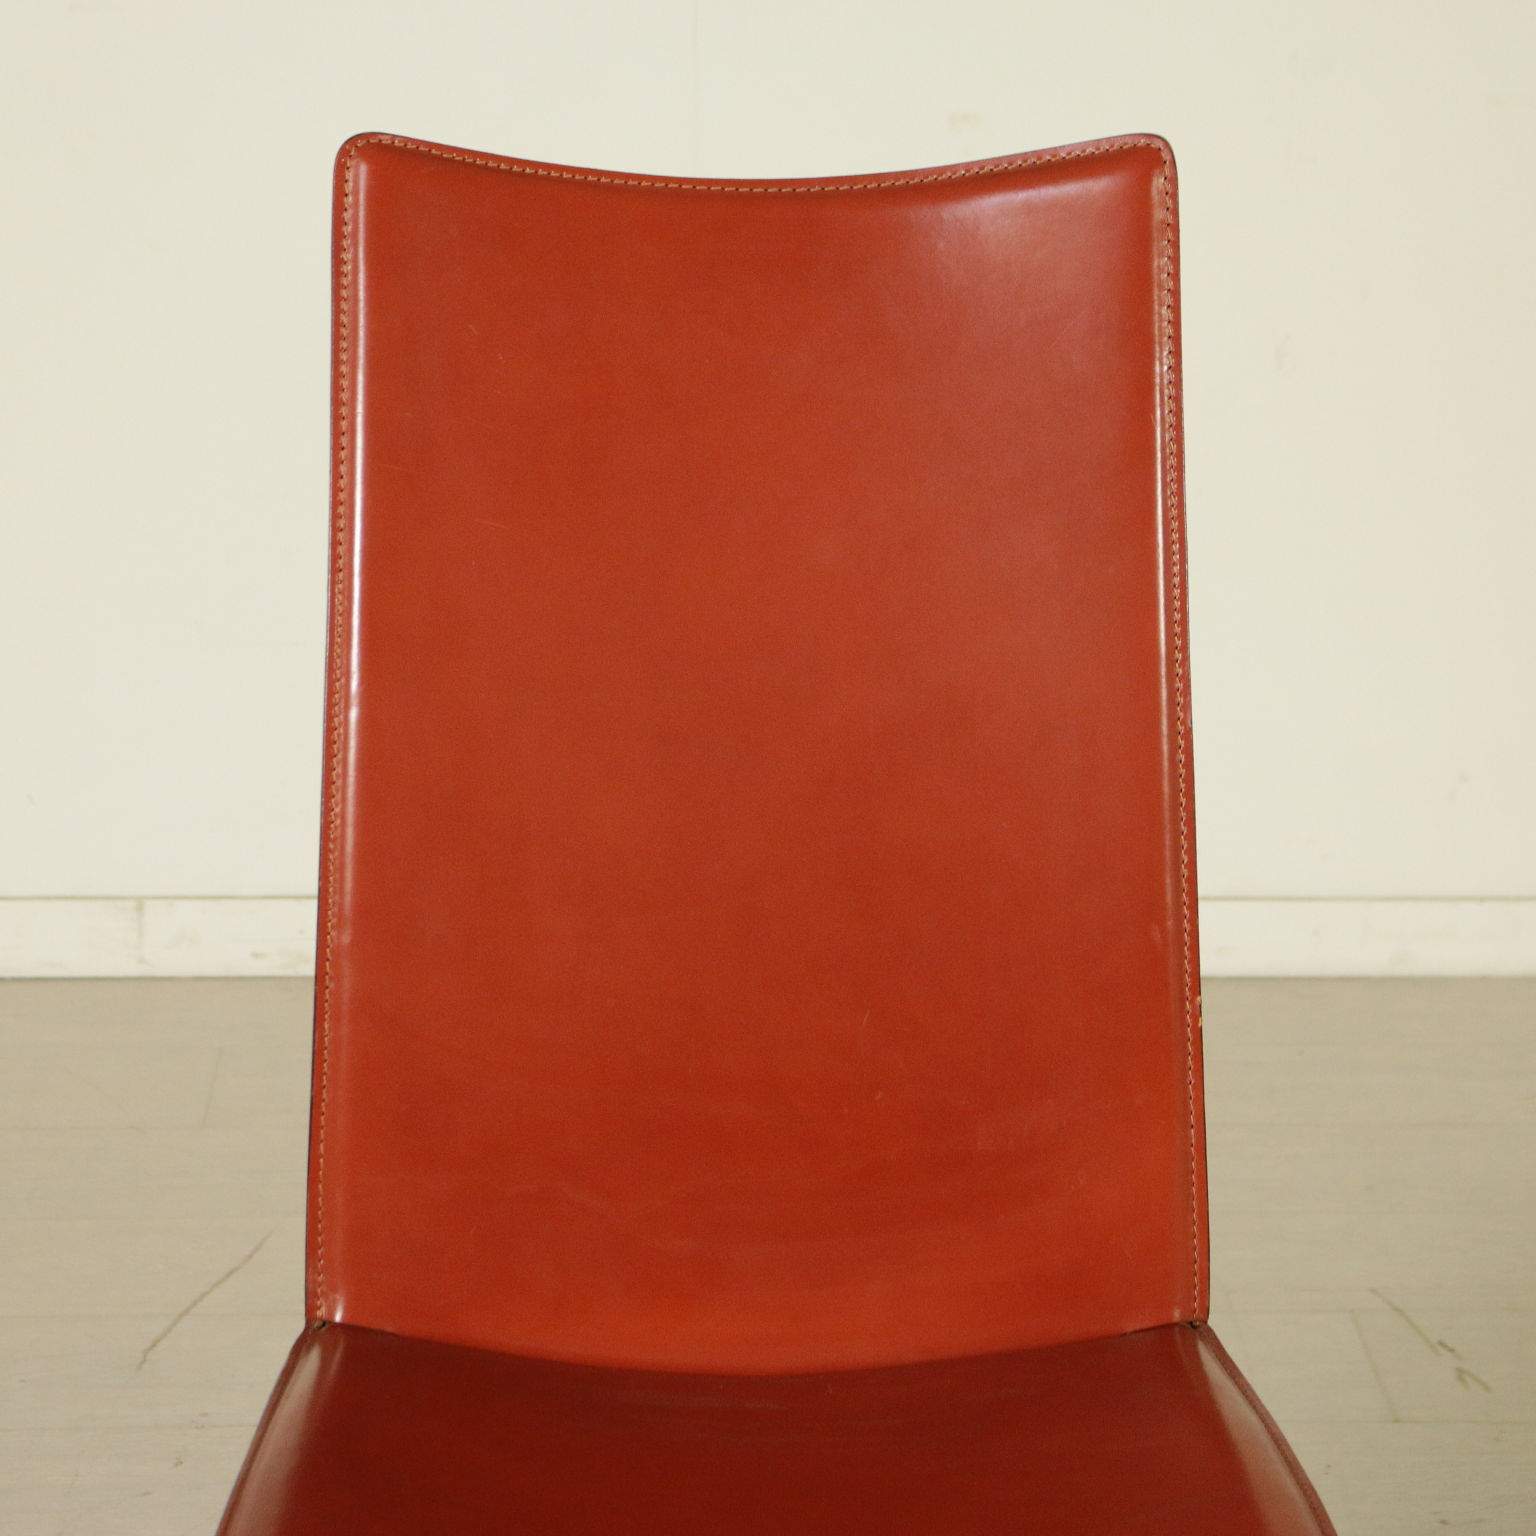 Смотреть Стул Филиппа II (La silla de Felipe II) видео